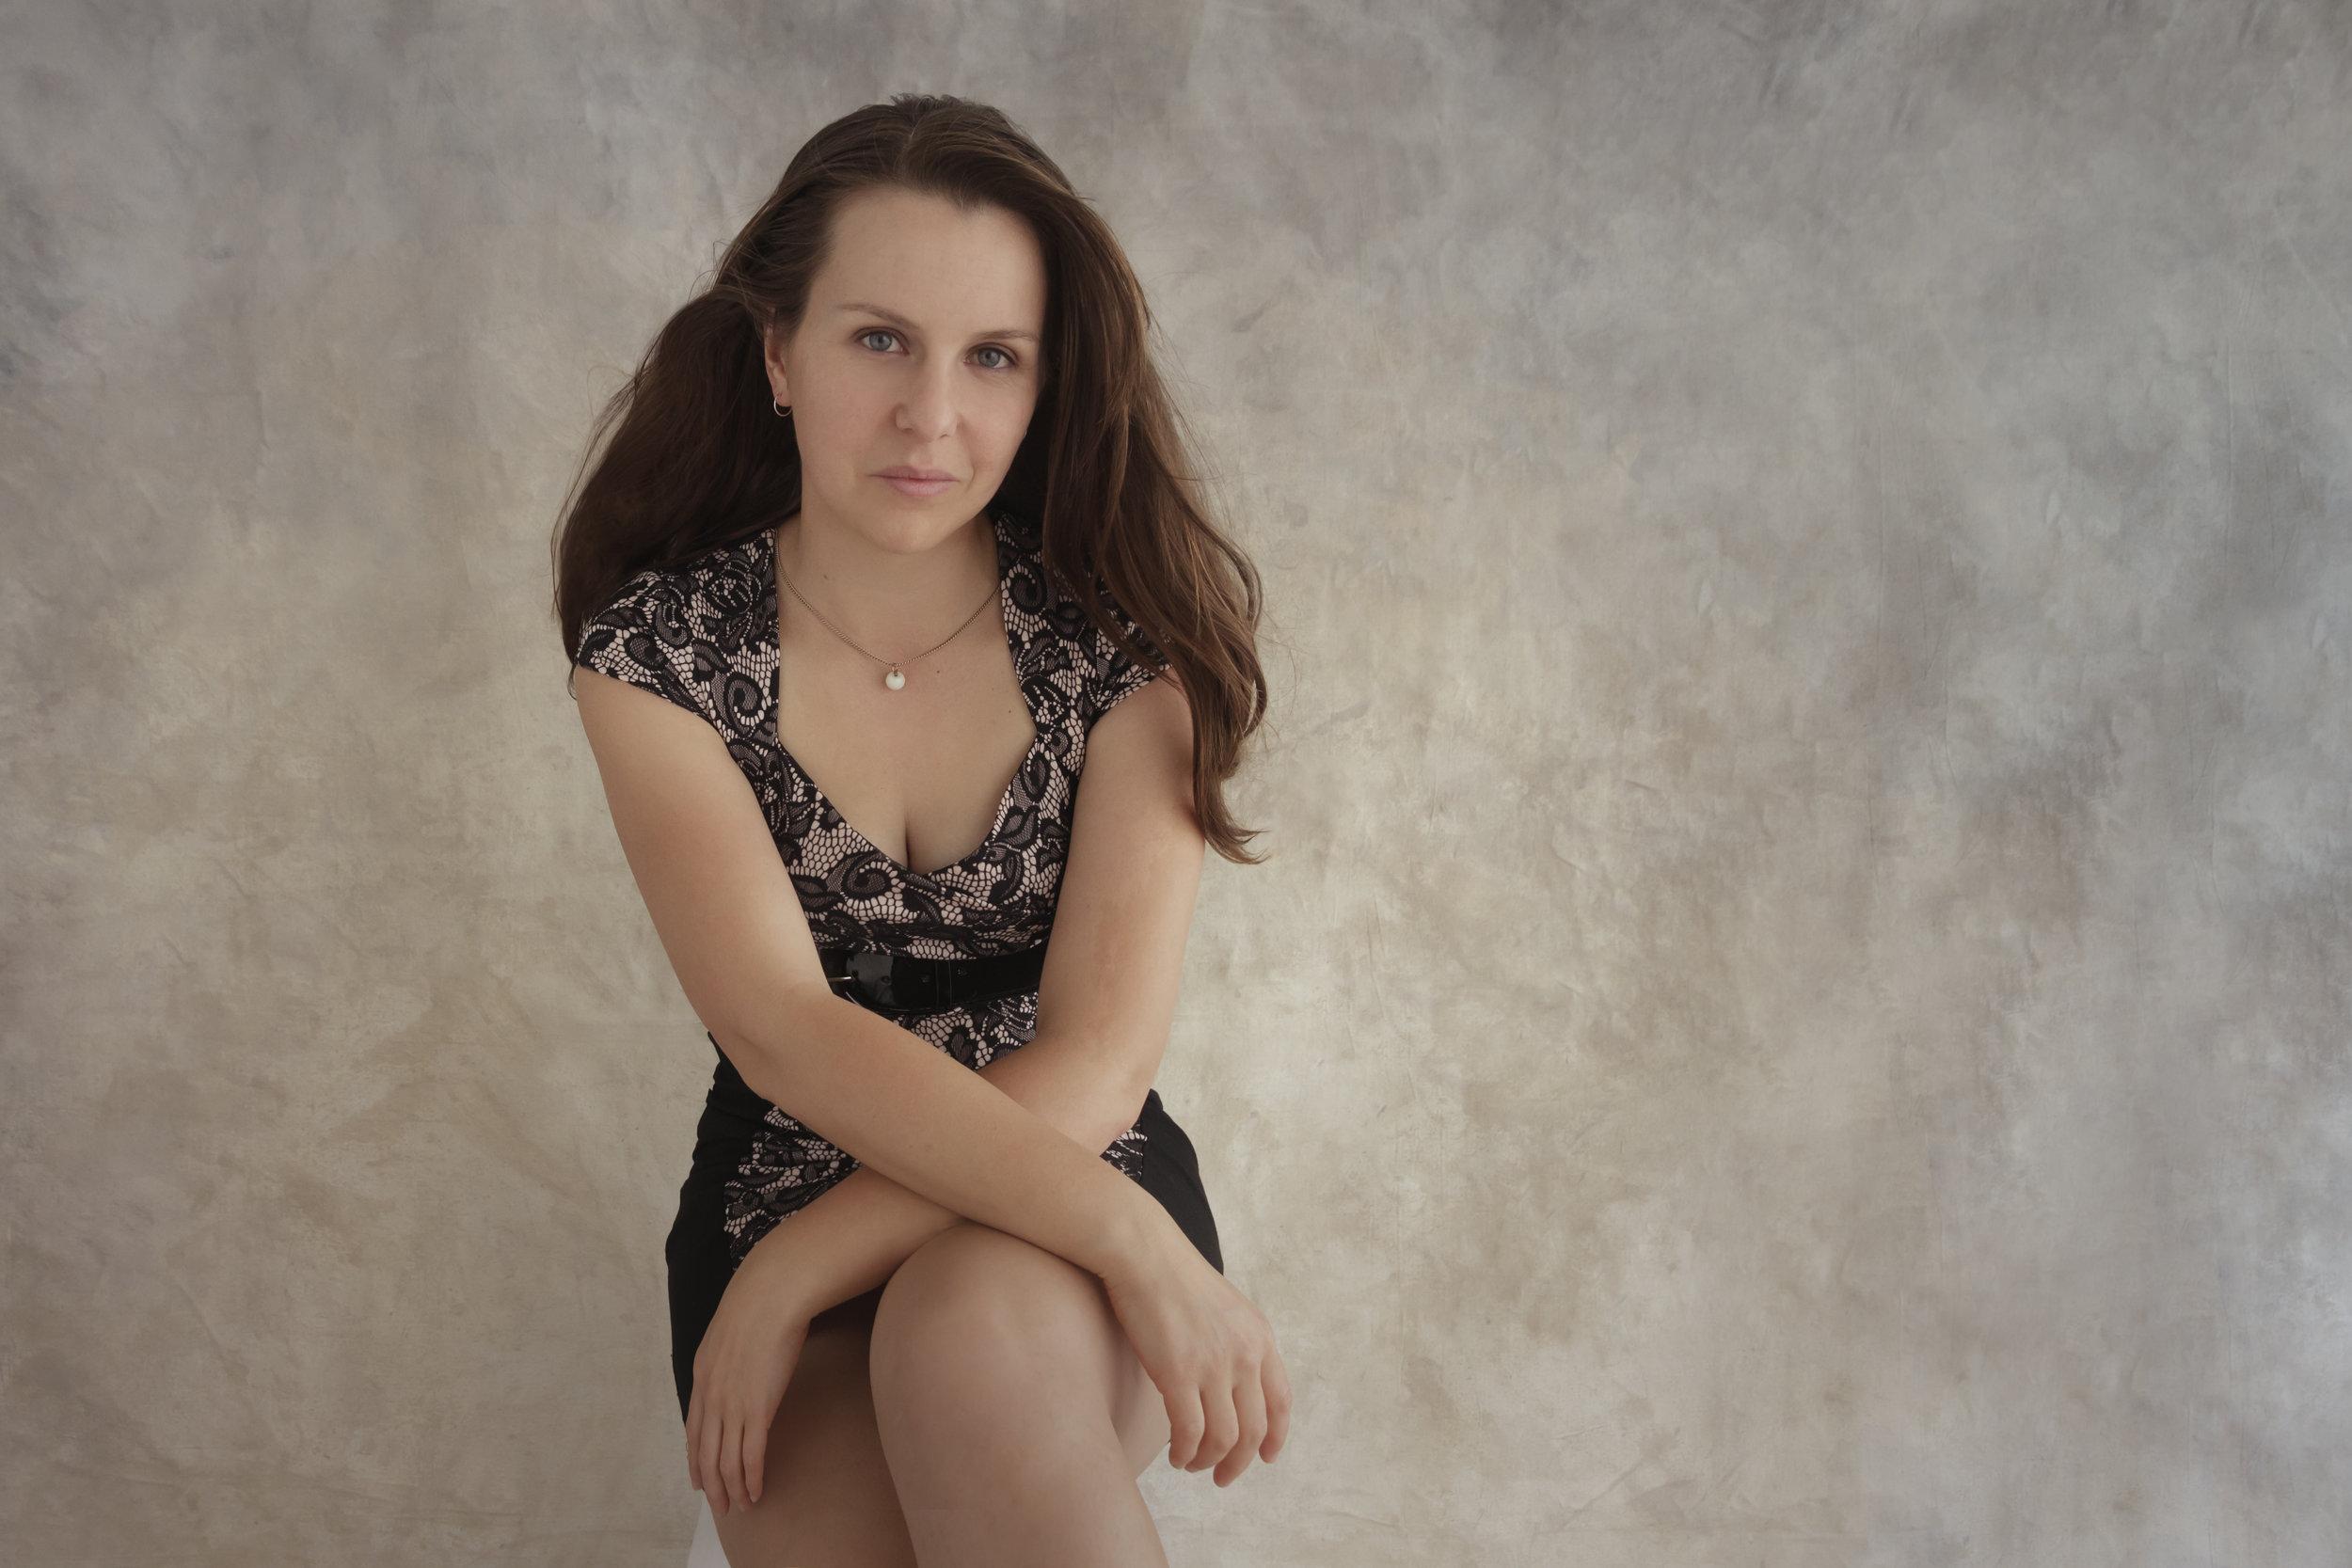 Sarahlee-Studio-Photographer-whangarei-Northland-New-Zealand